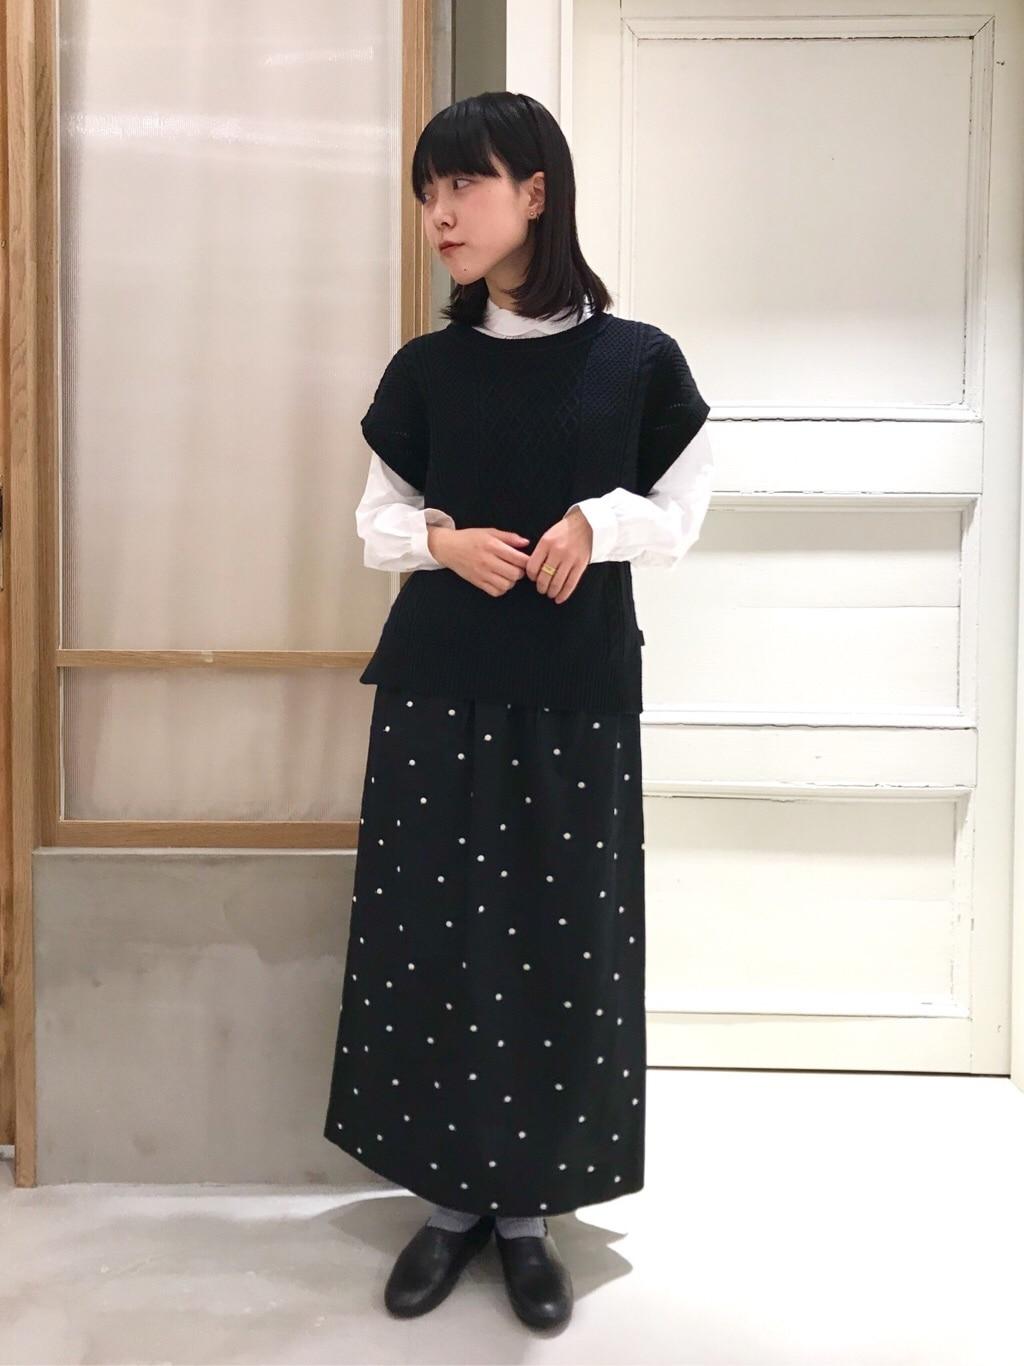 bulle de savon 渋谷スクランブルスクエア 身長:153cm 2020.01.21